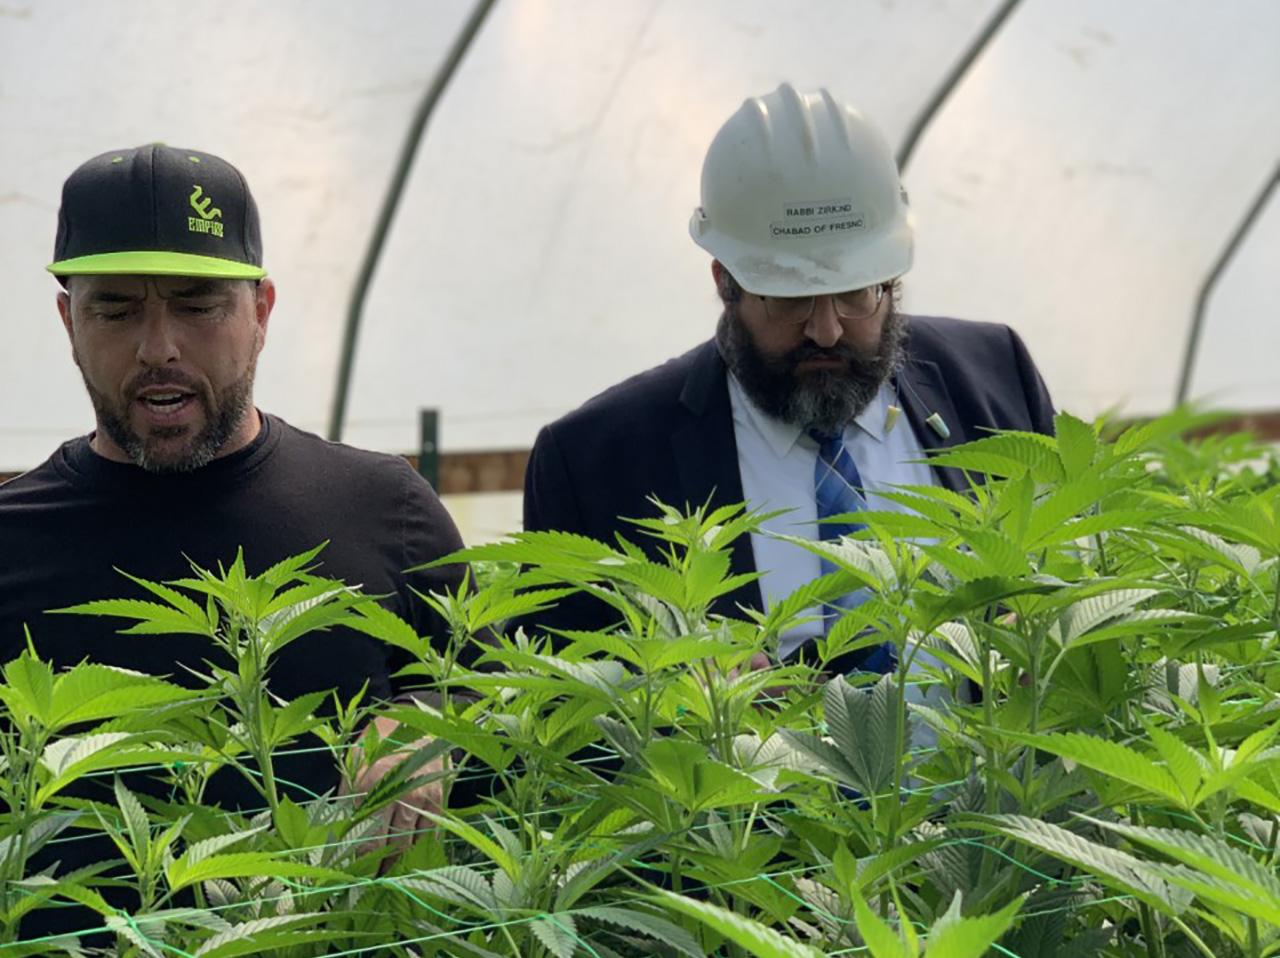 Cali Kosher owner Darron Silva (left) looks over his crop with Rabbi Levy Zirkind. (Photo/Courtesy Cali Kosher)